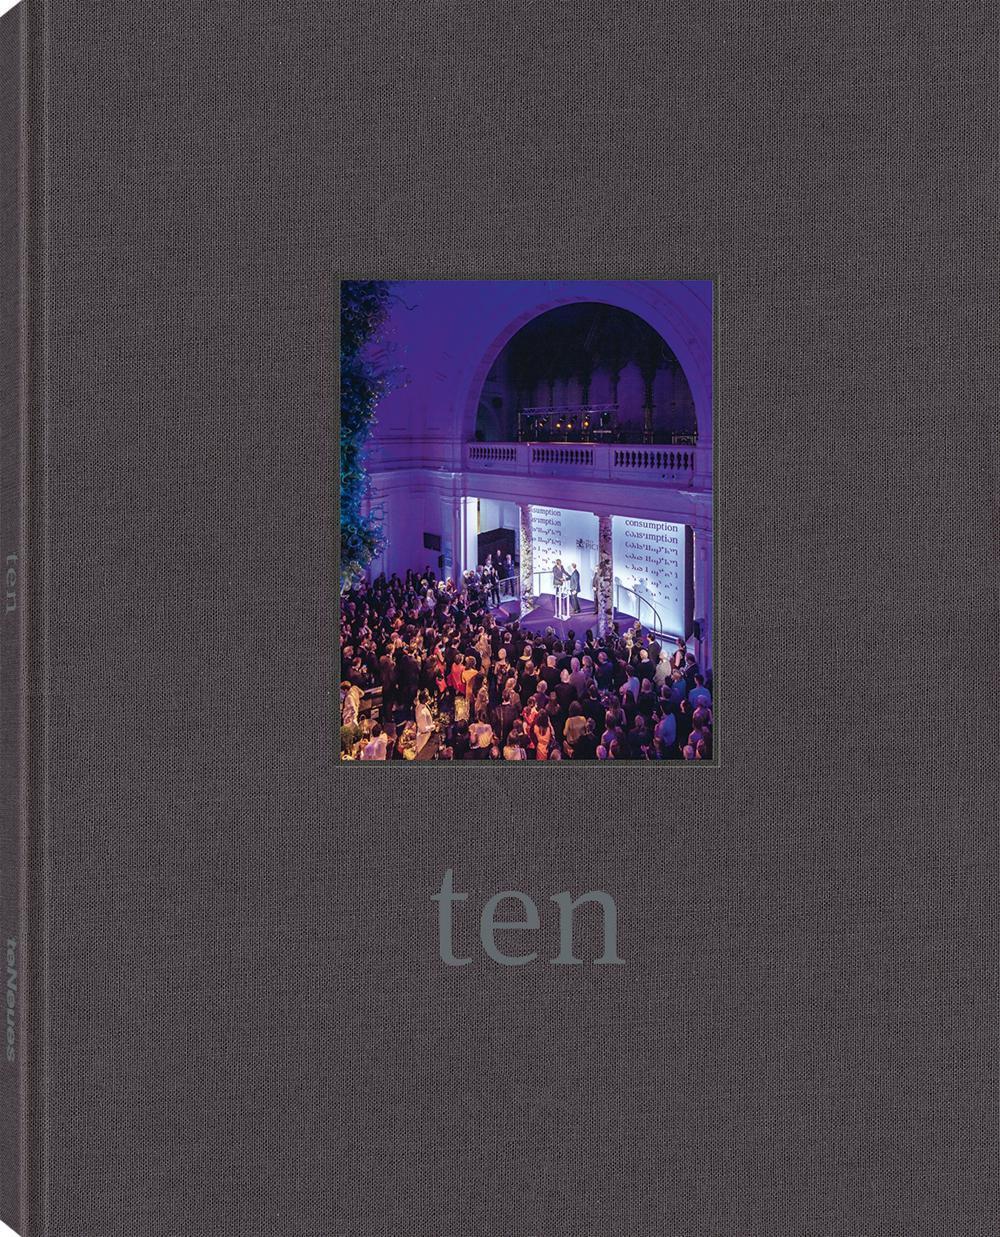 © TEN - Prix Pictet, erschienen bei teNeues, € 40,  www.teneues.com , © 2018 courtesy of The Prix Pictet Ltd.  www.prixpictet.com ,  www.pictet.com , Photo © Magnus Arrevad